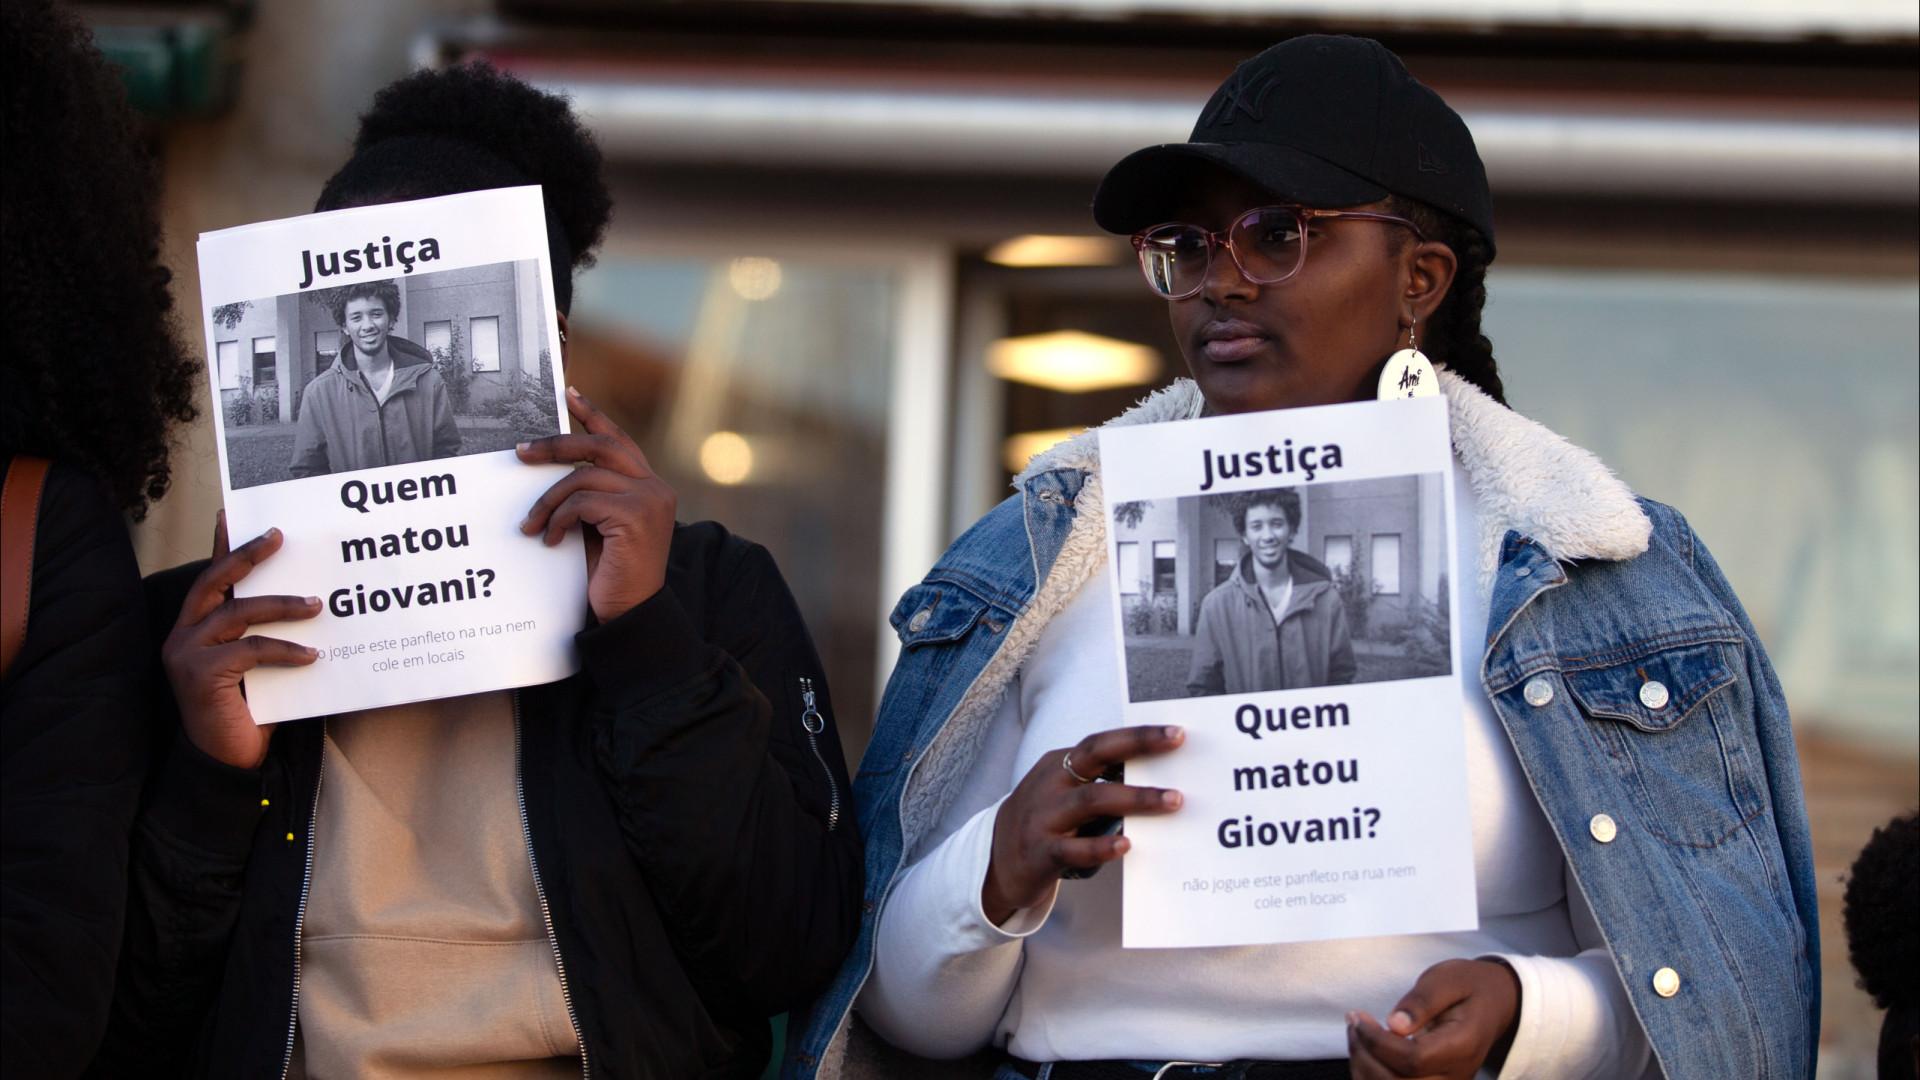 Mensagem de Luís Giovani surpreende julgamento em Bragança